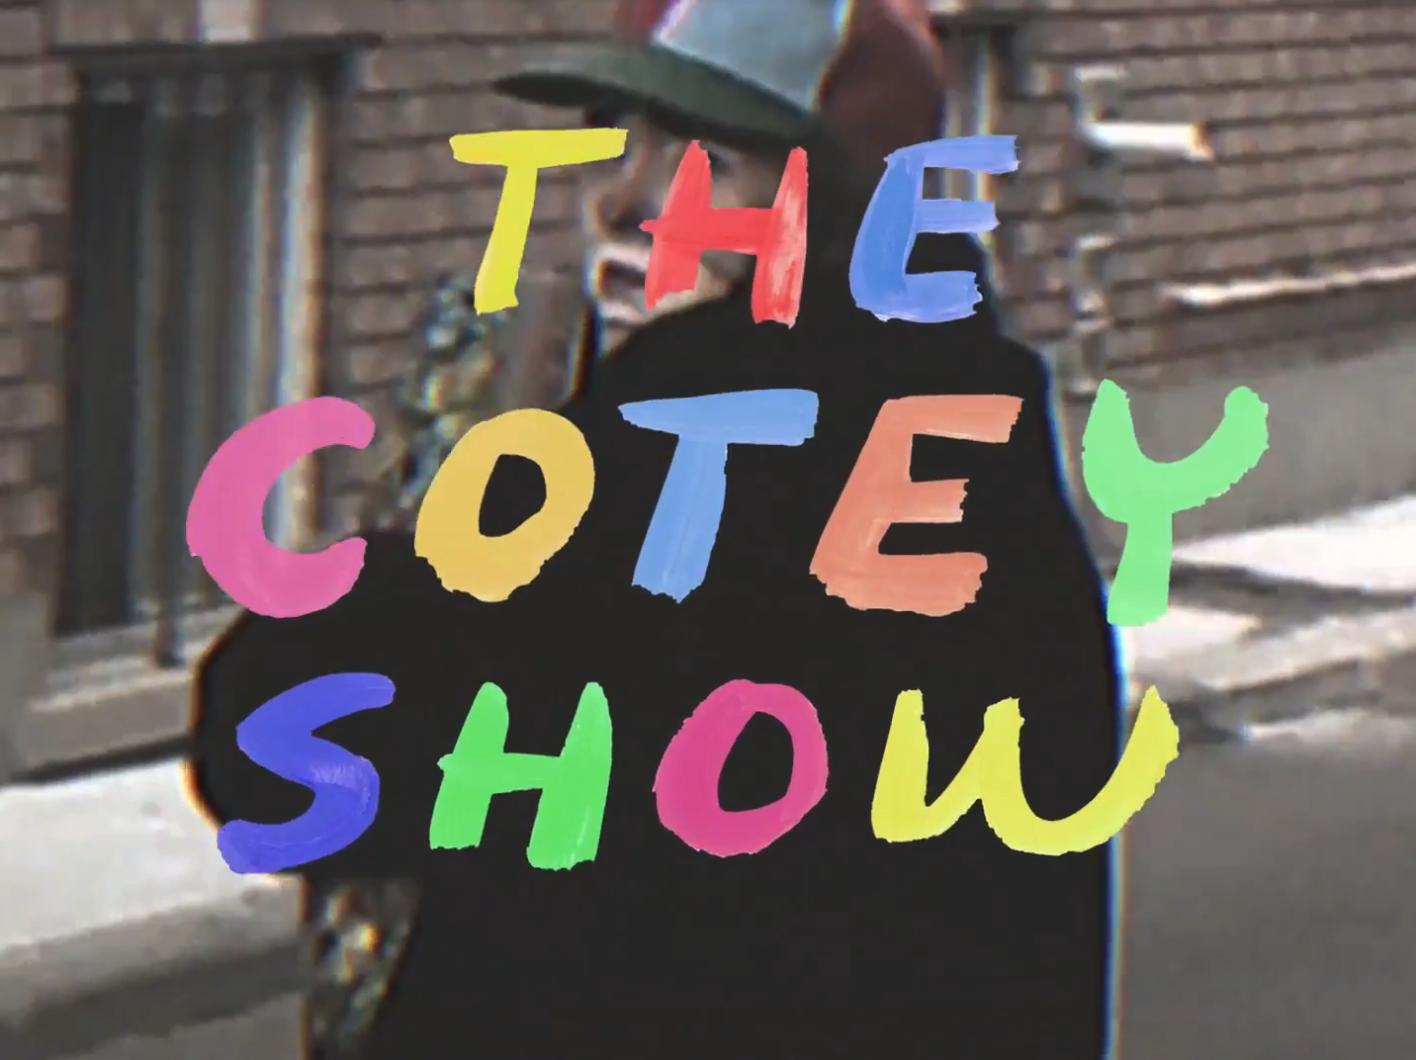 The Cotey Show